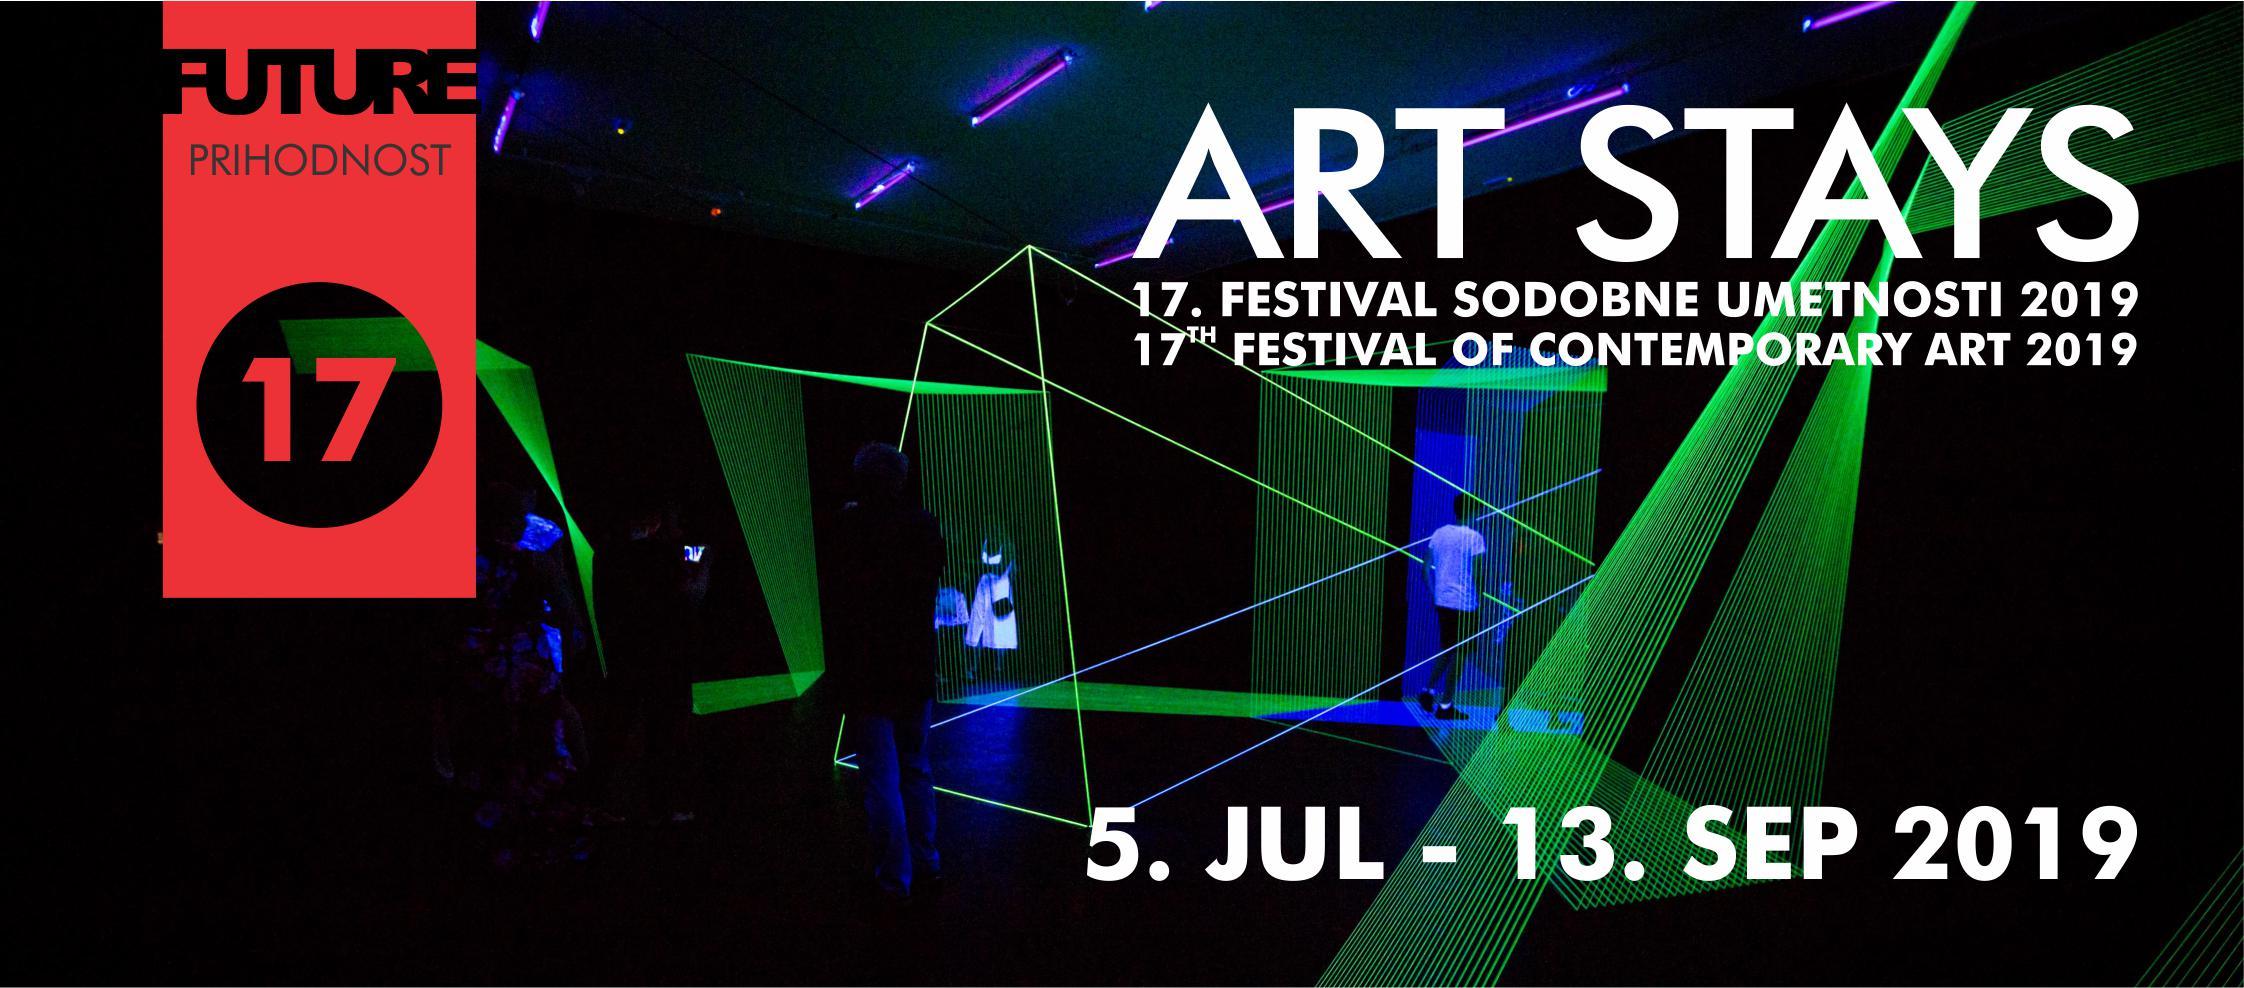 17. Art Stays Festival – FUTURE / PRIHODNOST